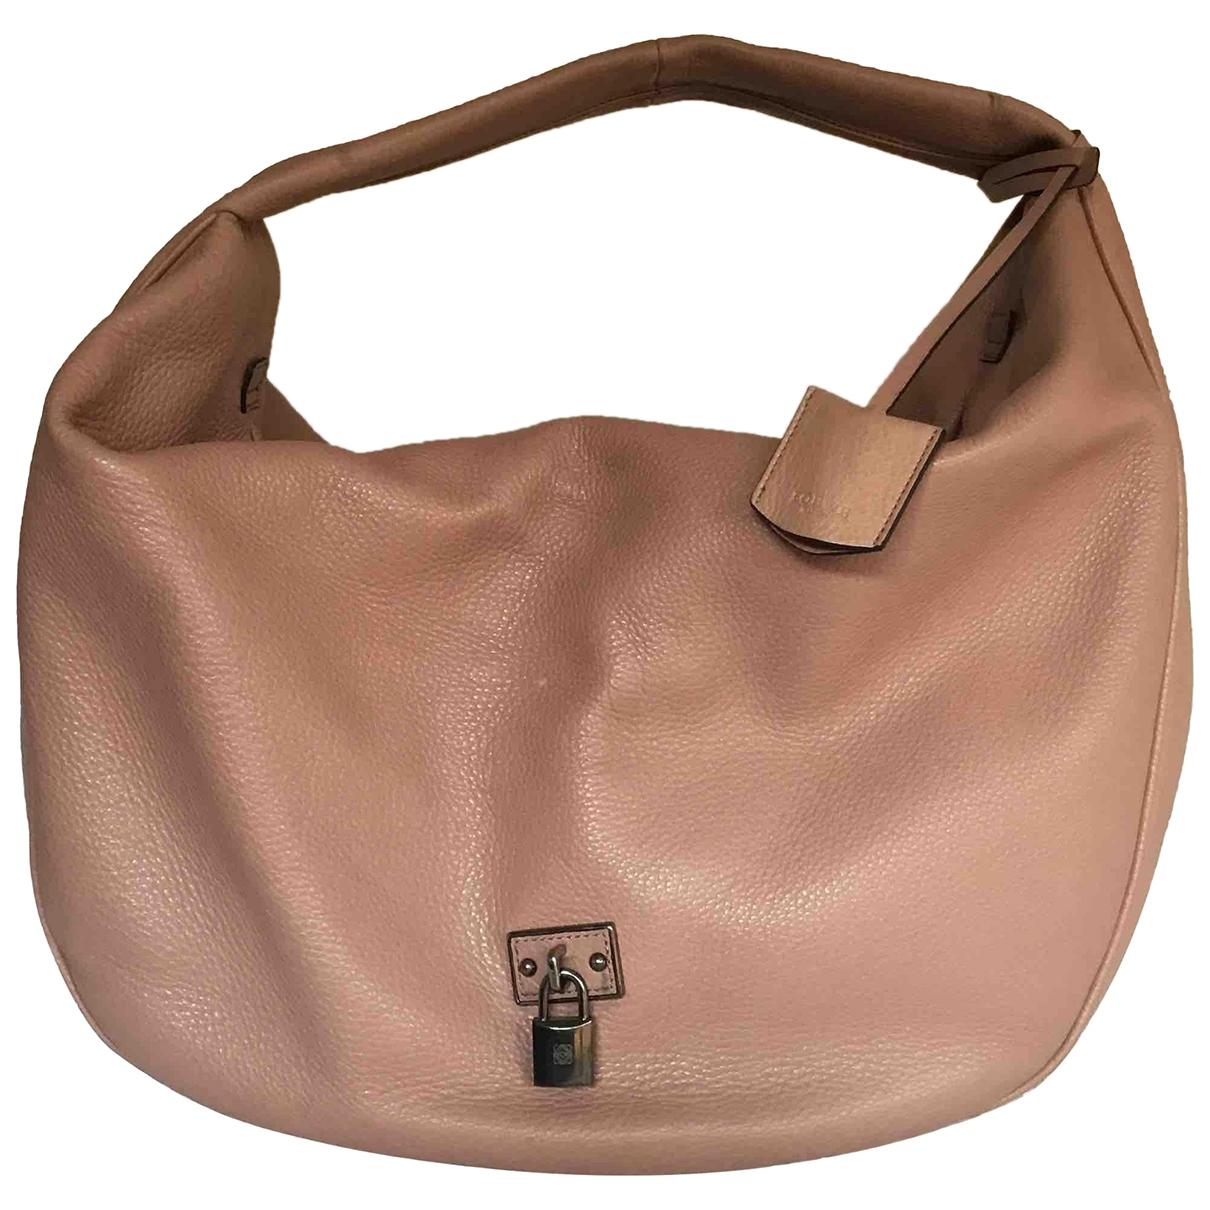 Loewe - Sac a main   pour femme en cuir - rose